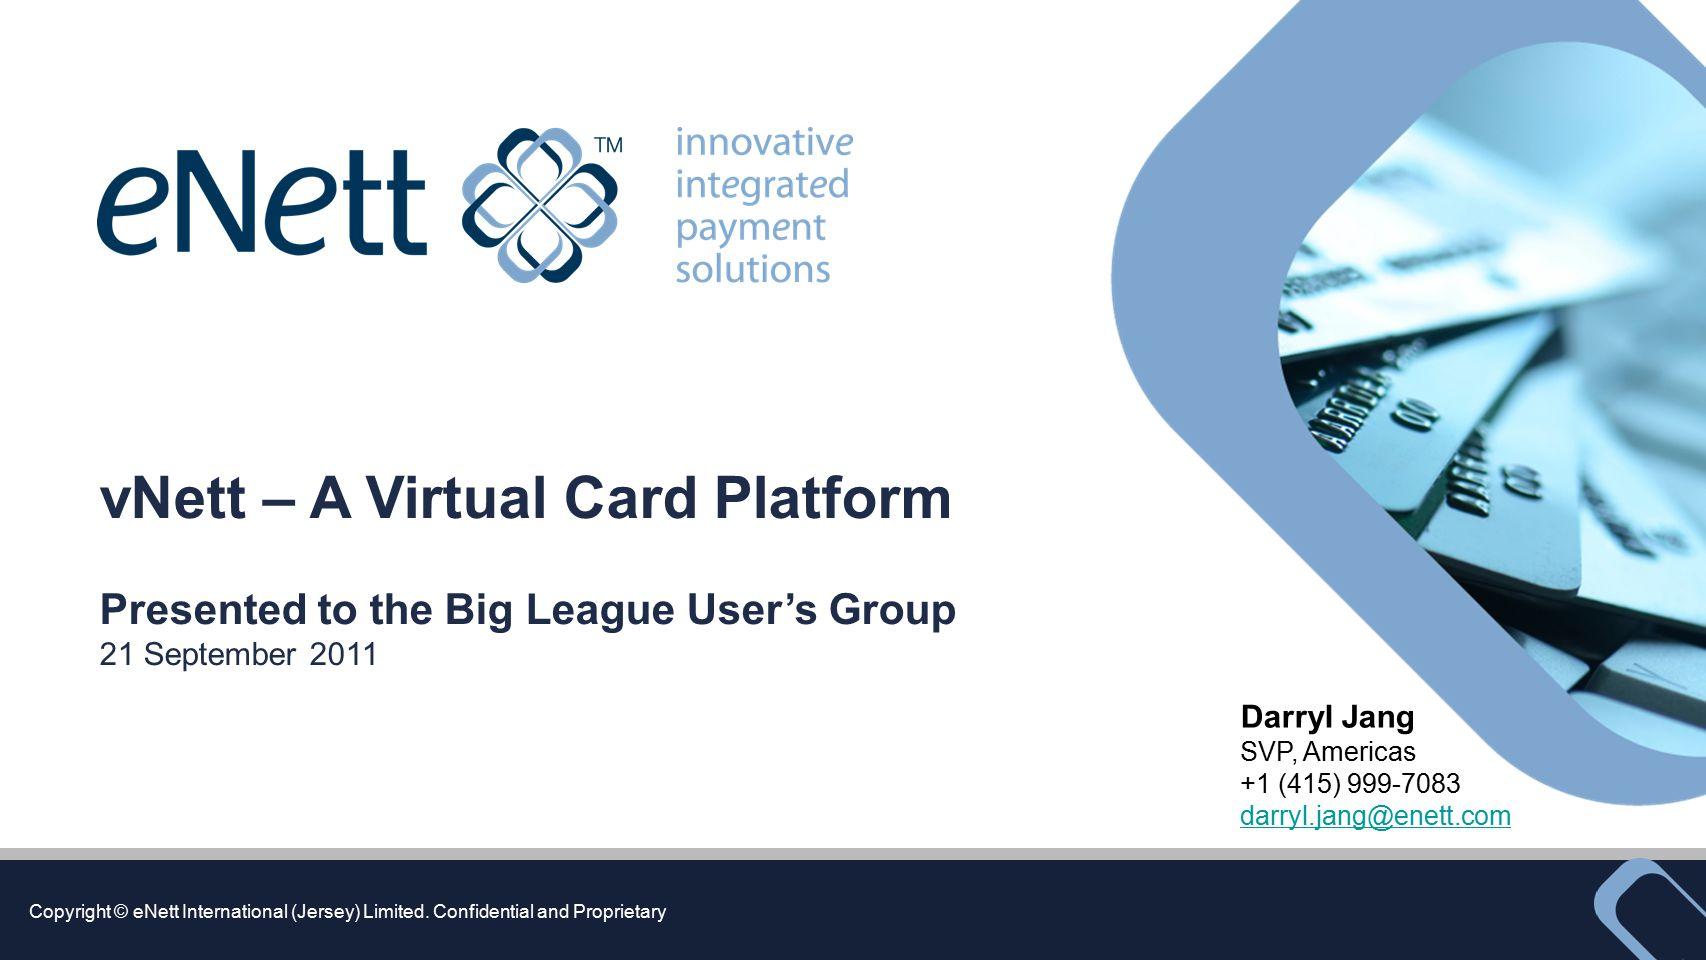 vNett – A Virtual Card Platform